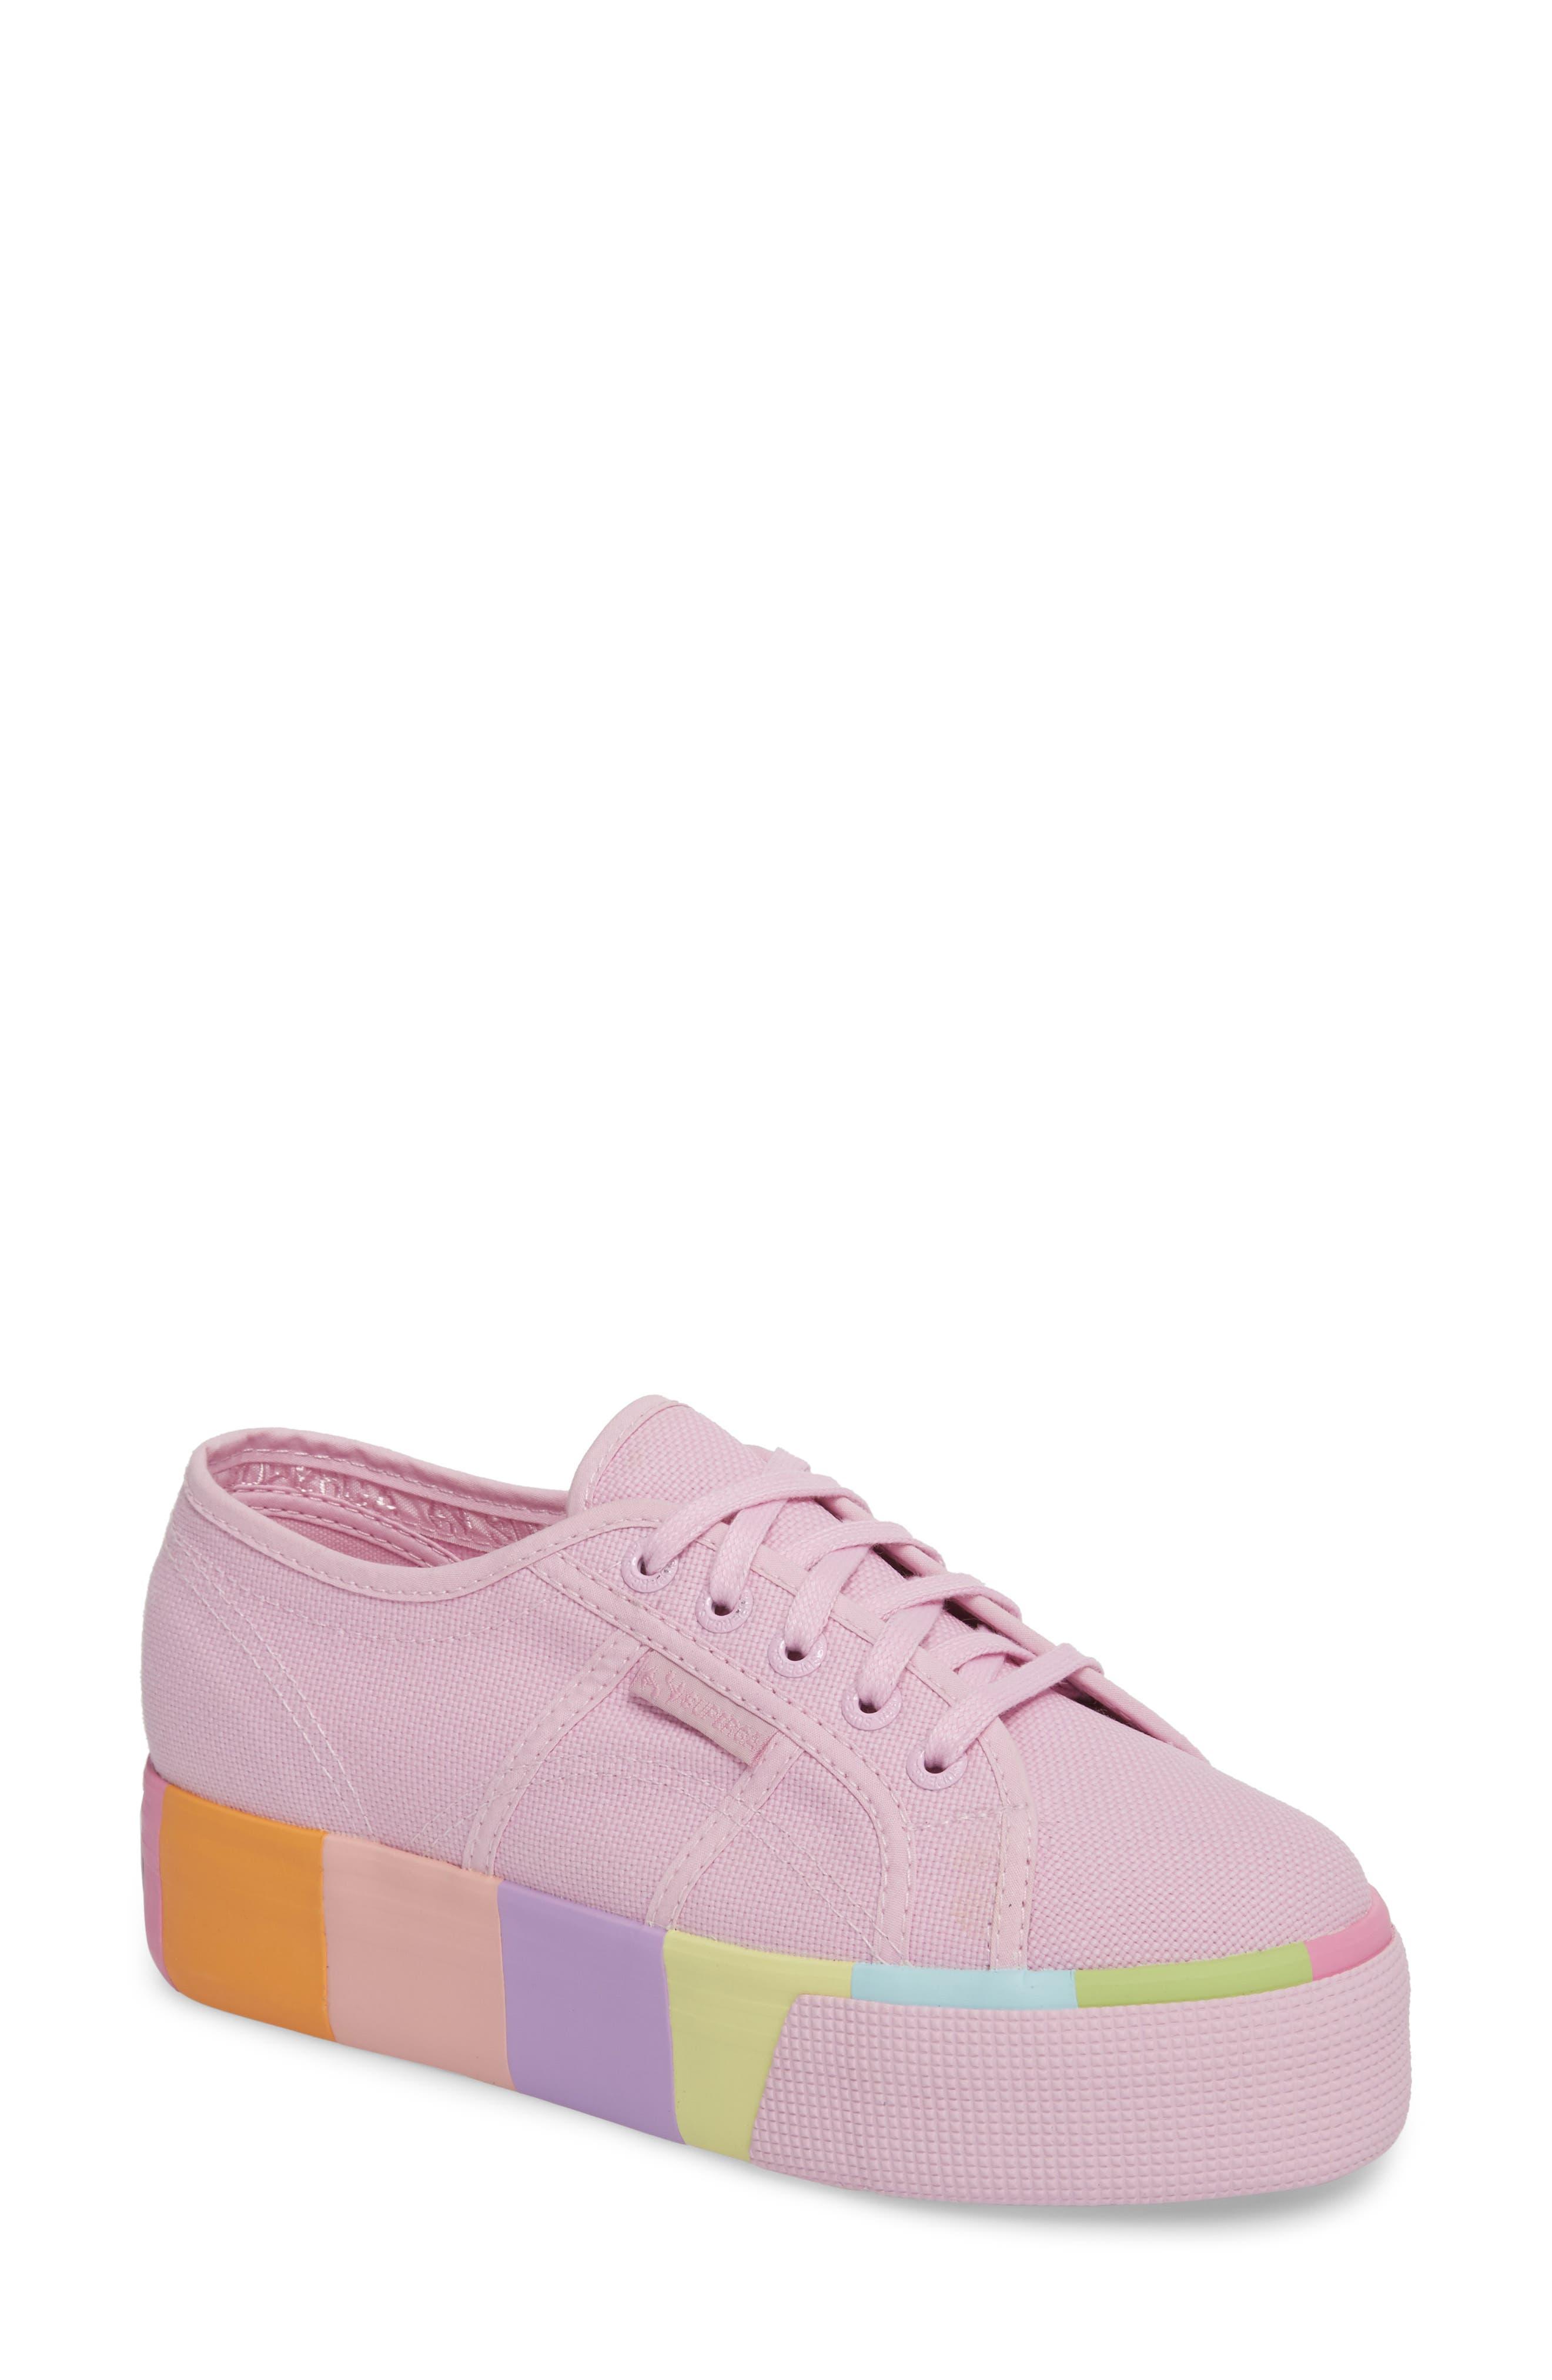 2790 Platform Sneaker,                             Main thumbnail 1, color,                             Pink